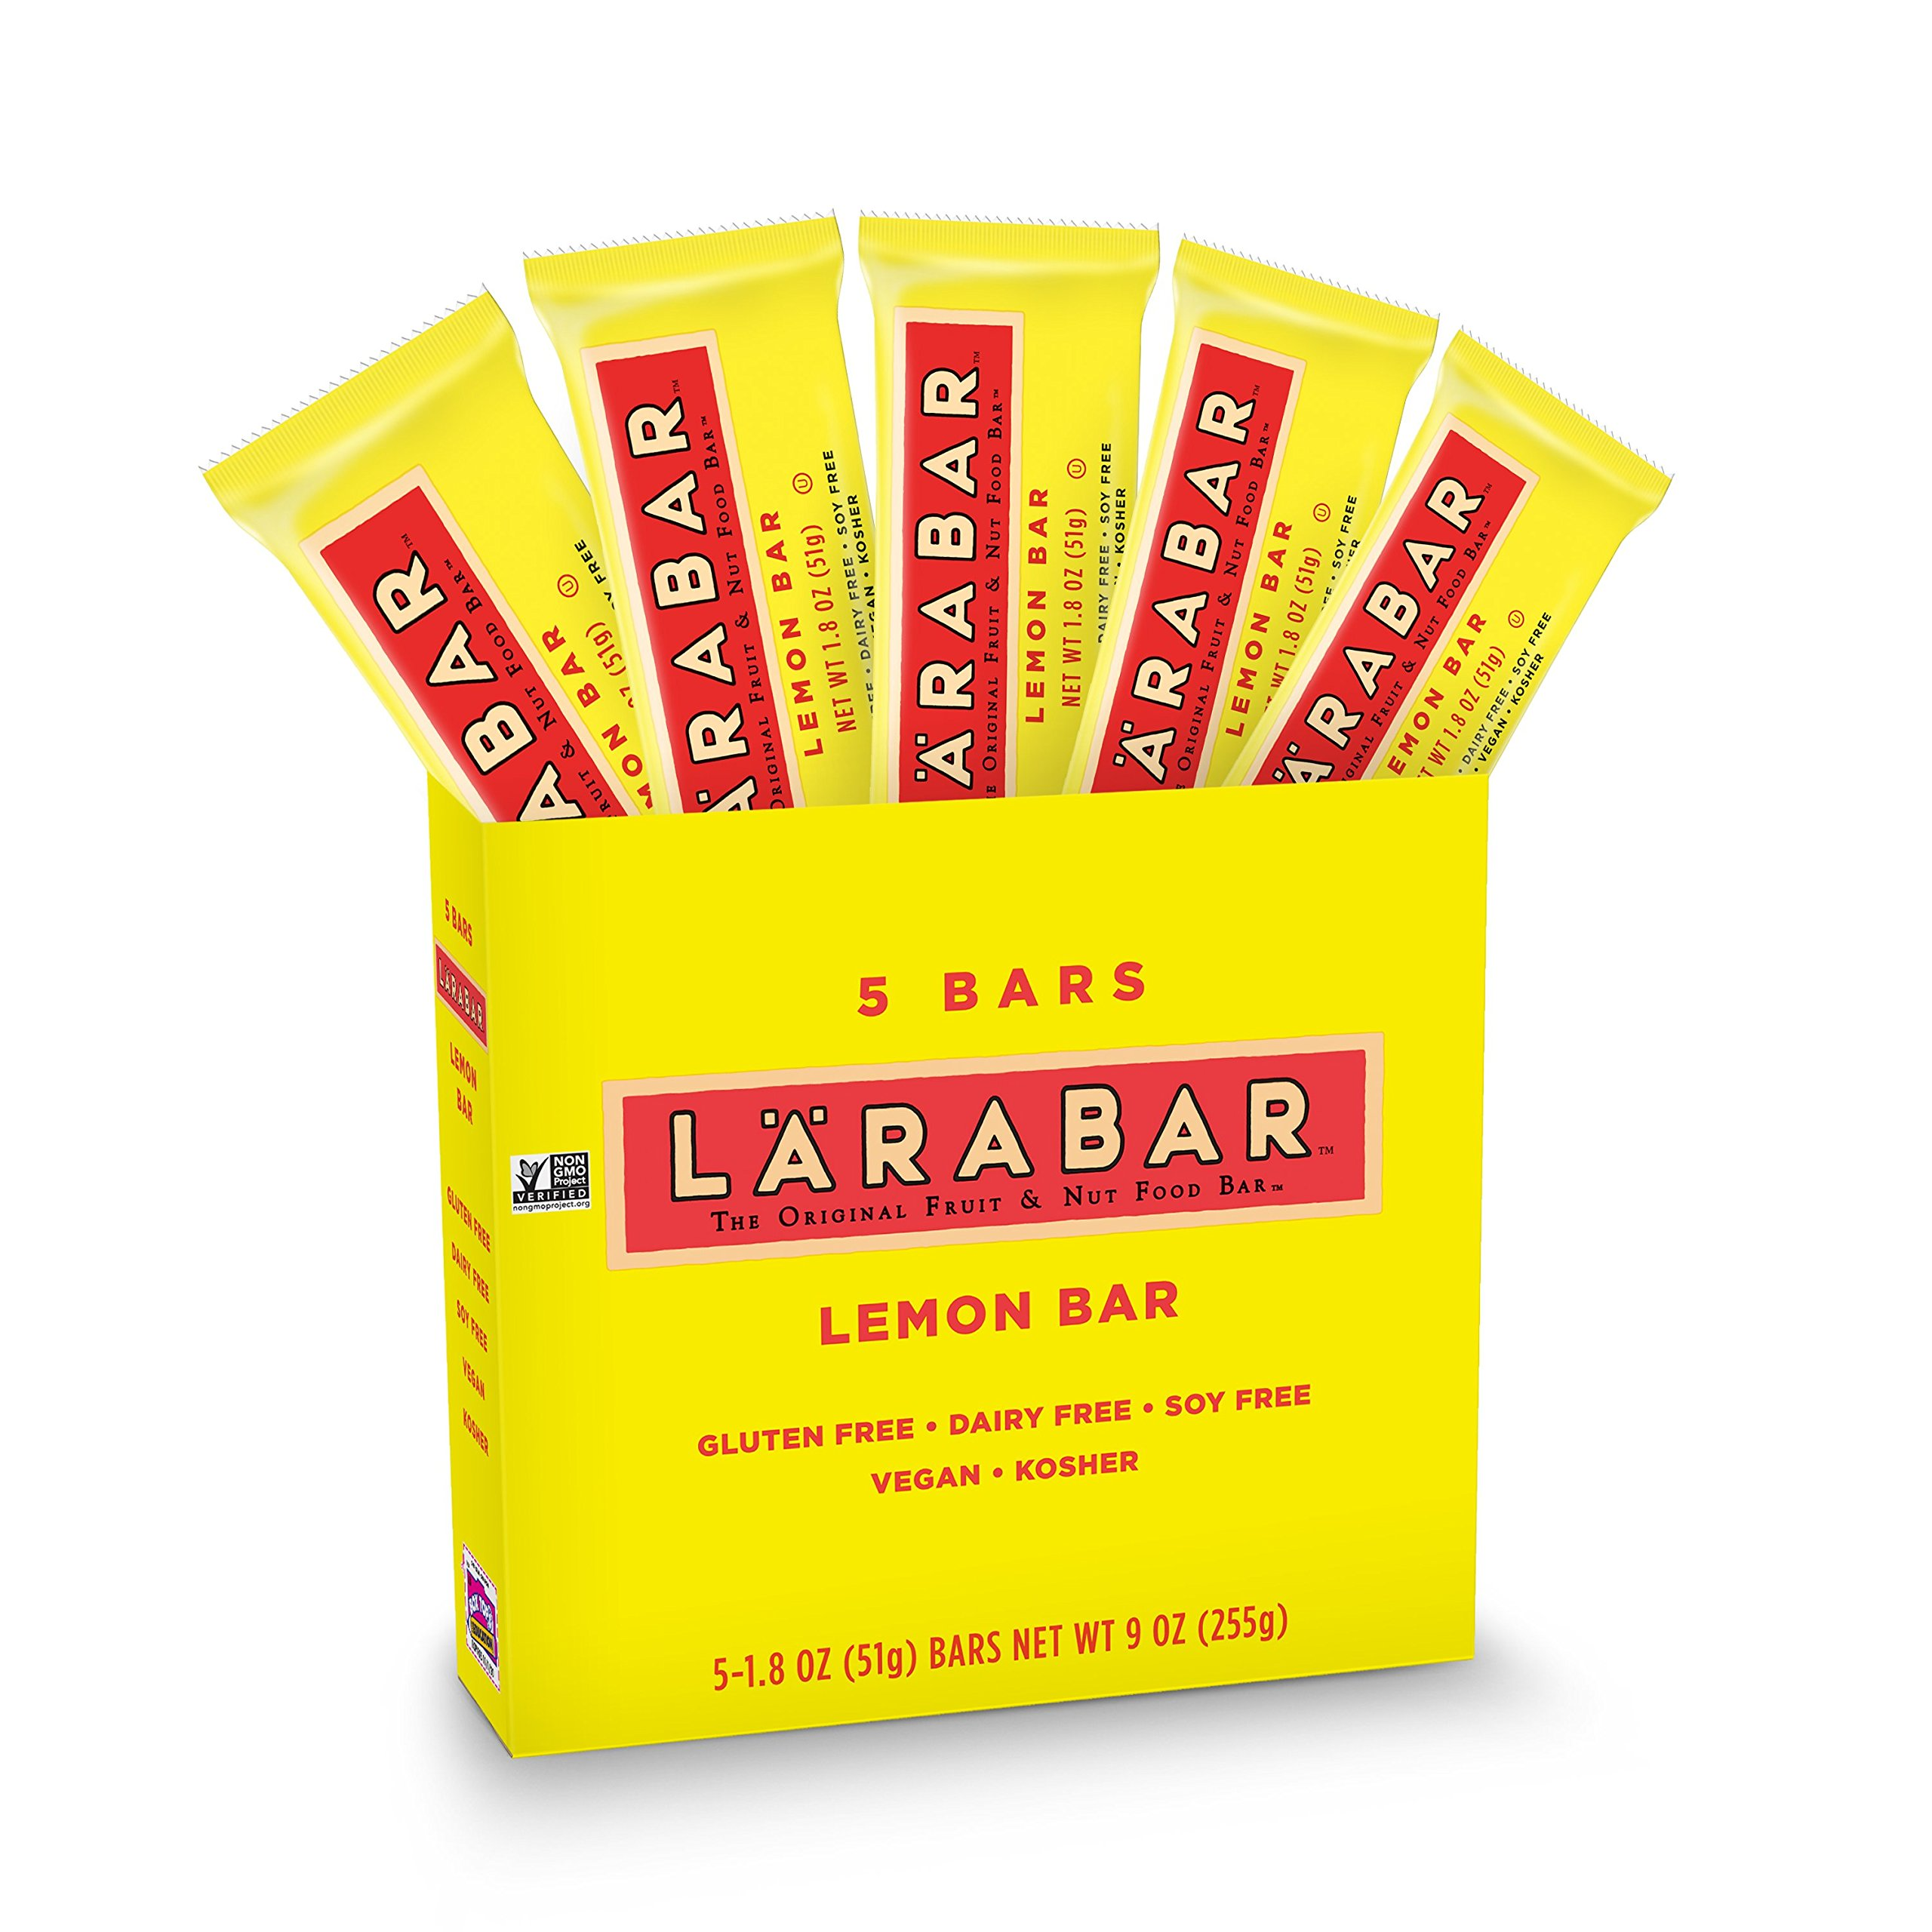 LARABAR, Fruit & Nut Bar, Lemon, Gluten Free, Vegan, Whole 30 Compliant, 5 Count, Pack of 8 by LÄRABAR